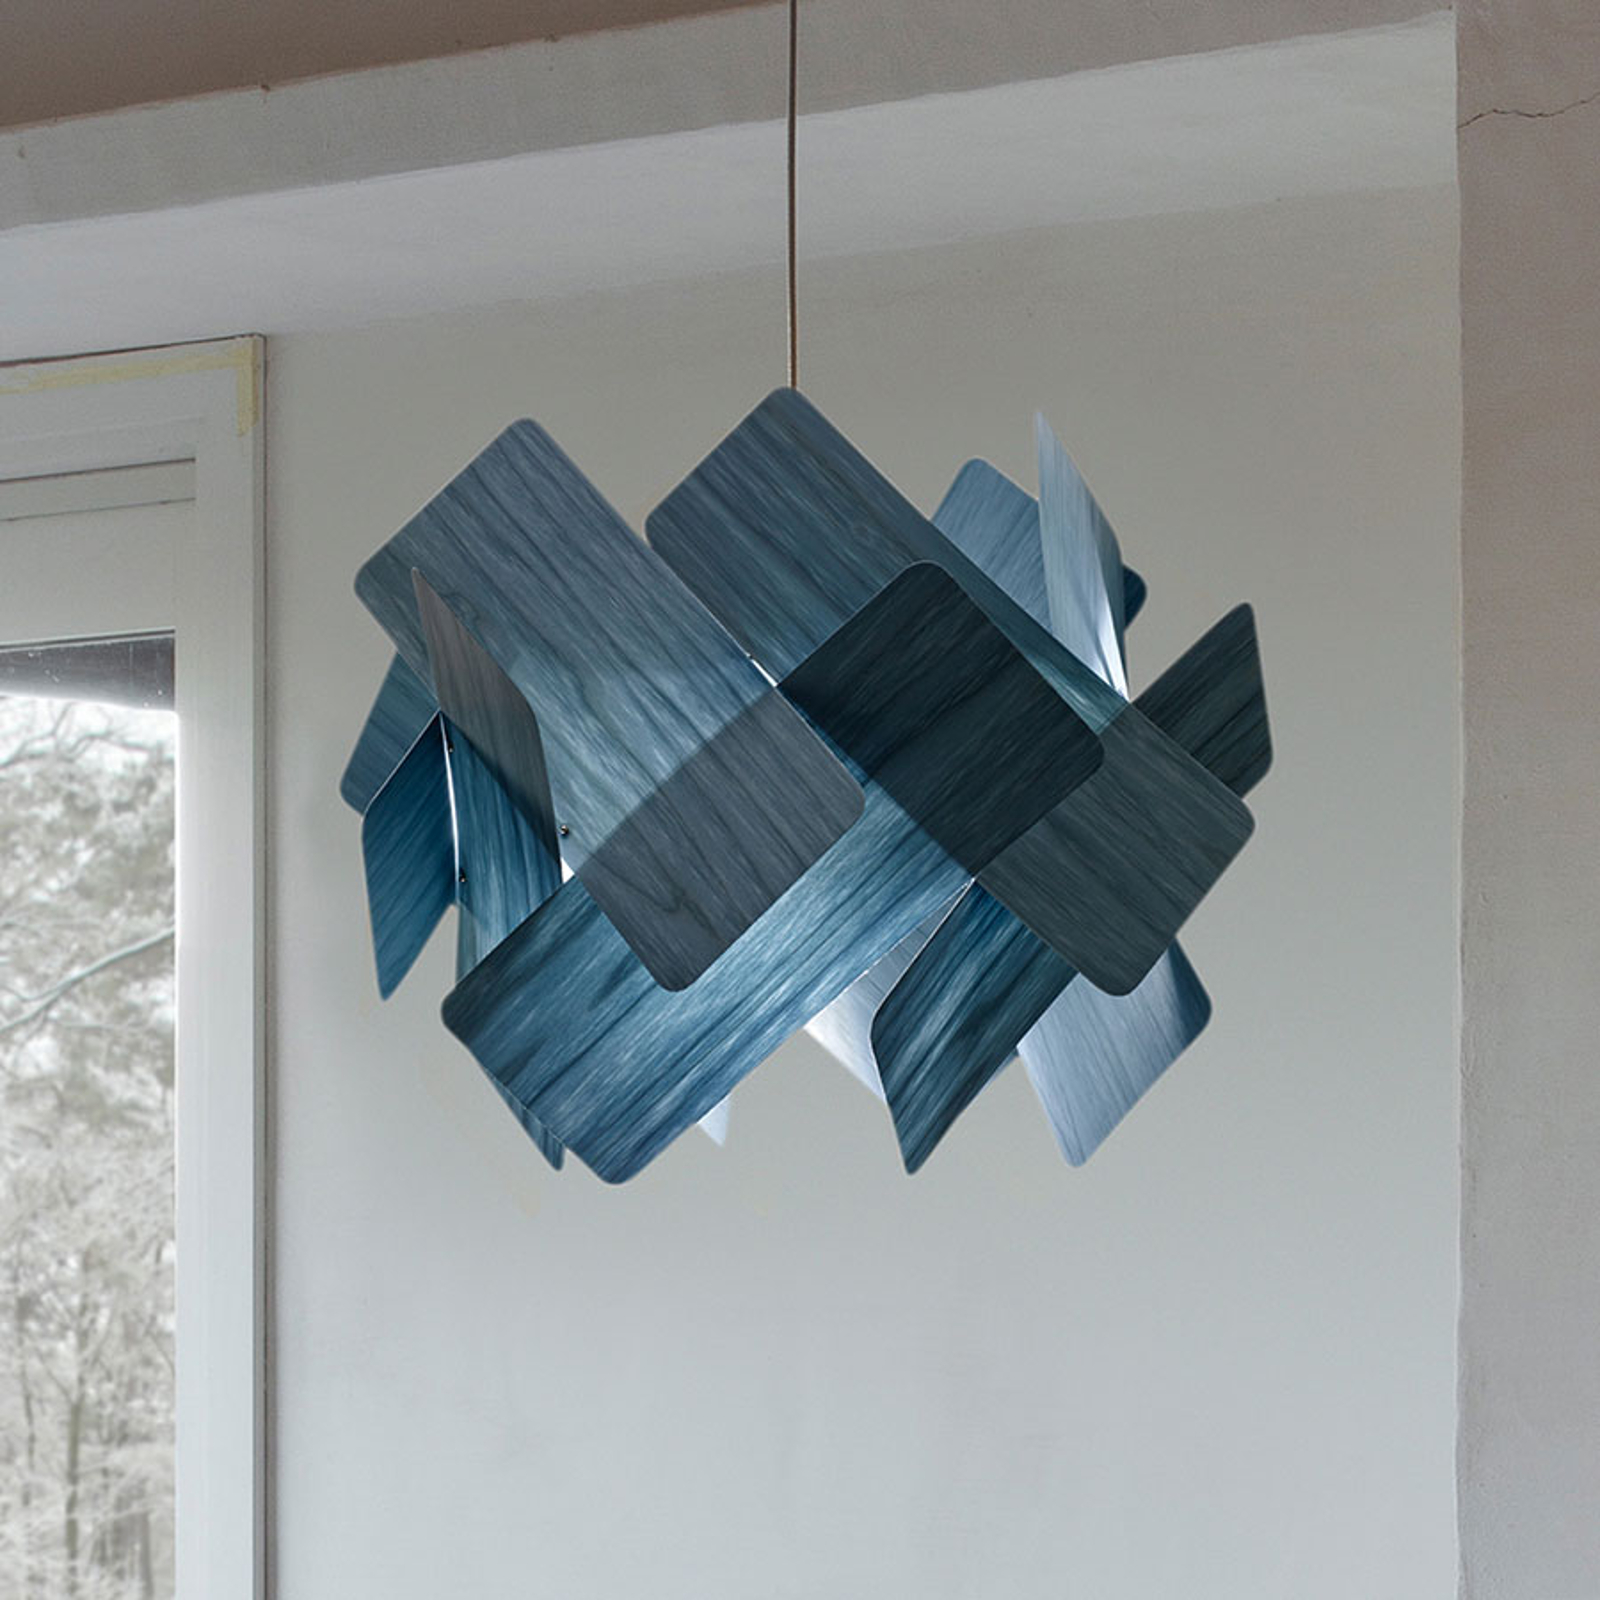 LZF Escape hanglamp, Ø 40 cm, blauw